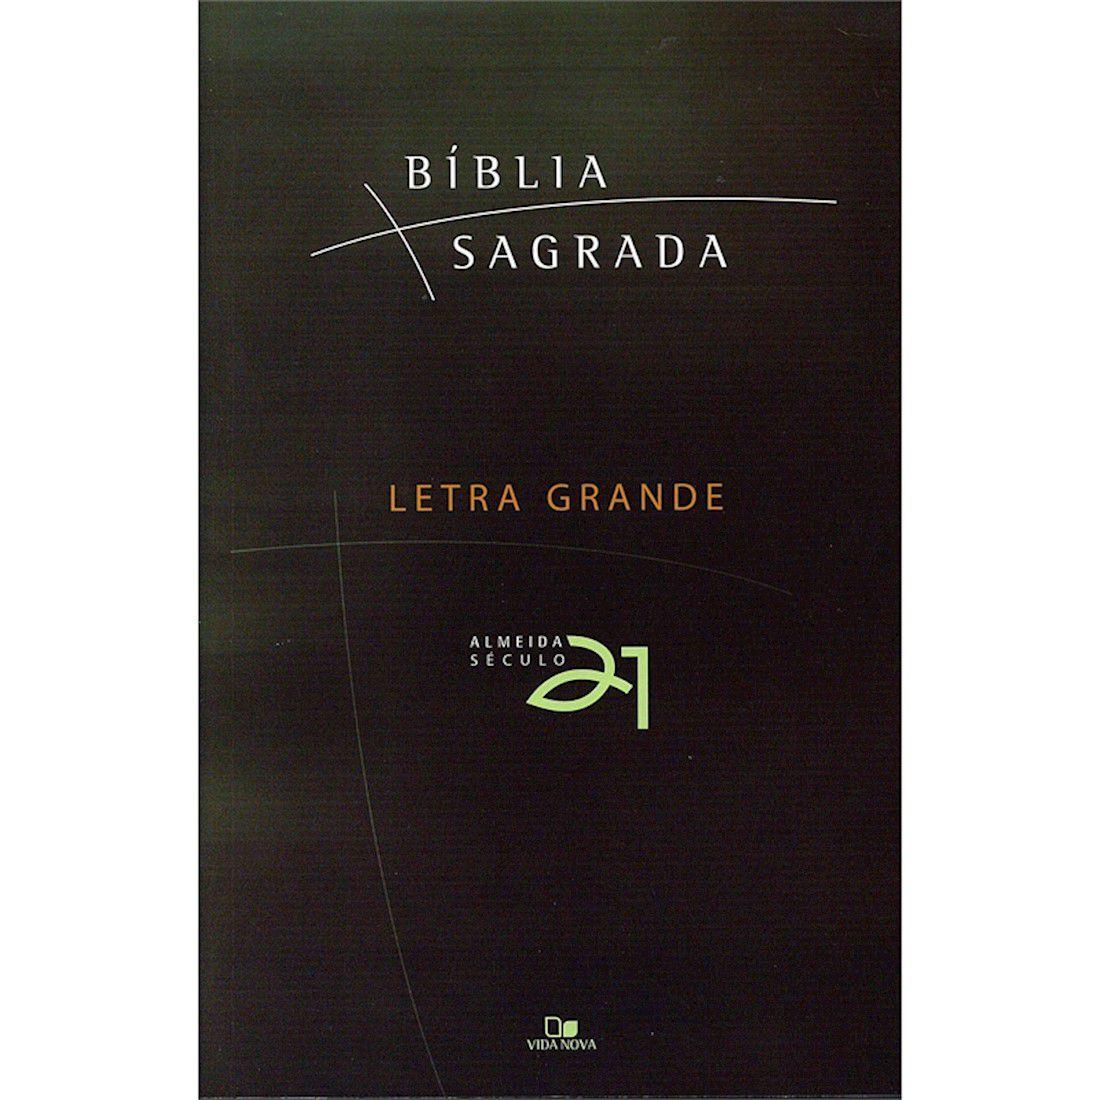 Bíblia Almeida Século 21 Letra Grande Brochura - Verde com Capa Cristal / Sobrecapa